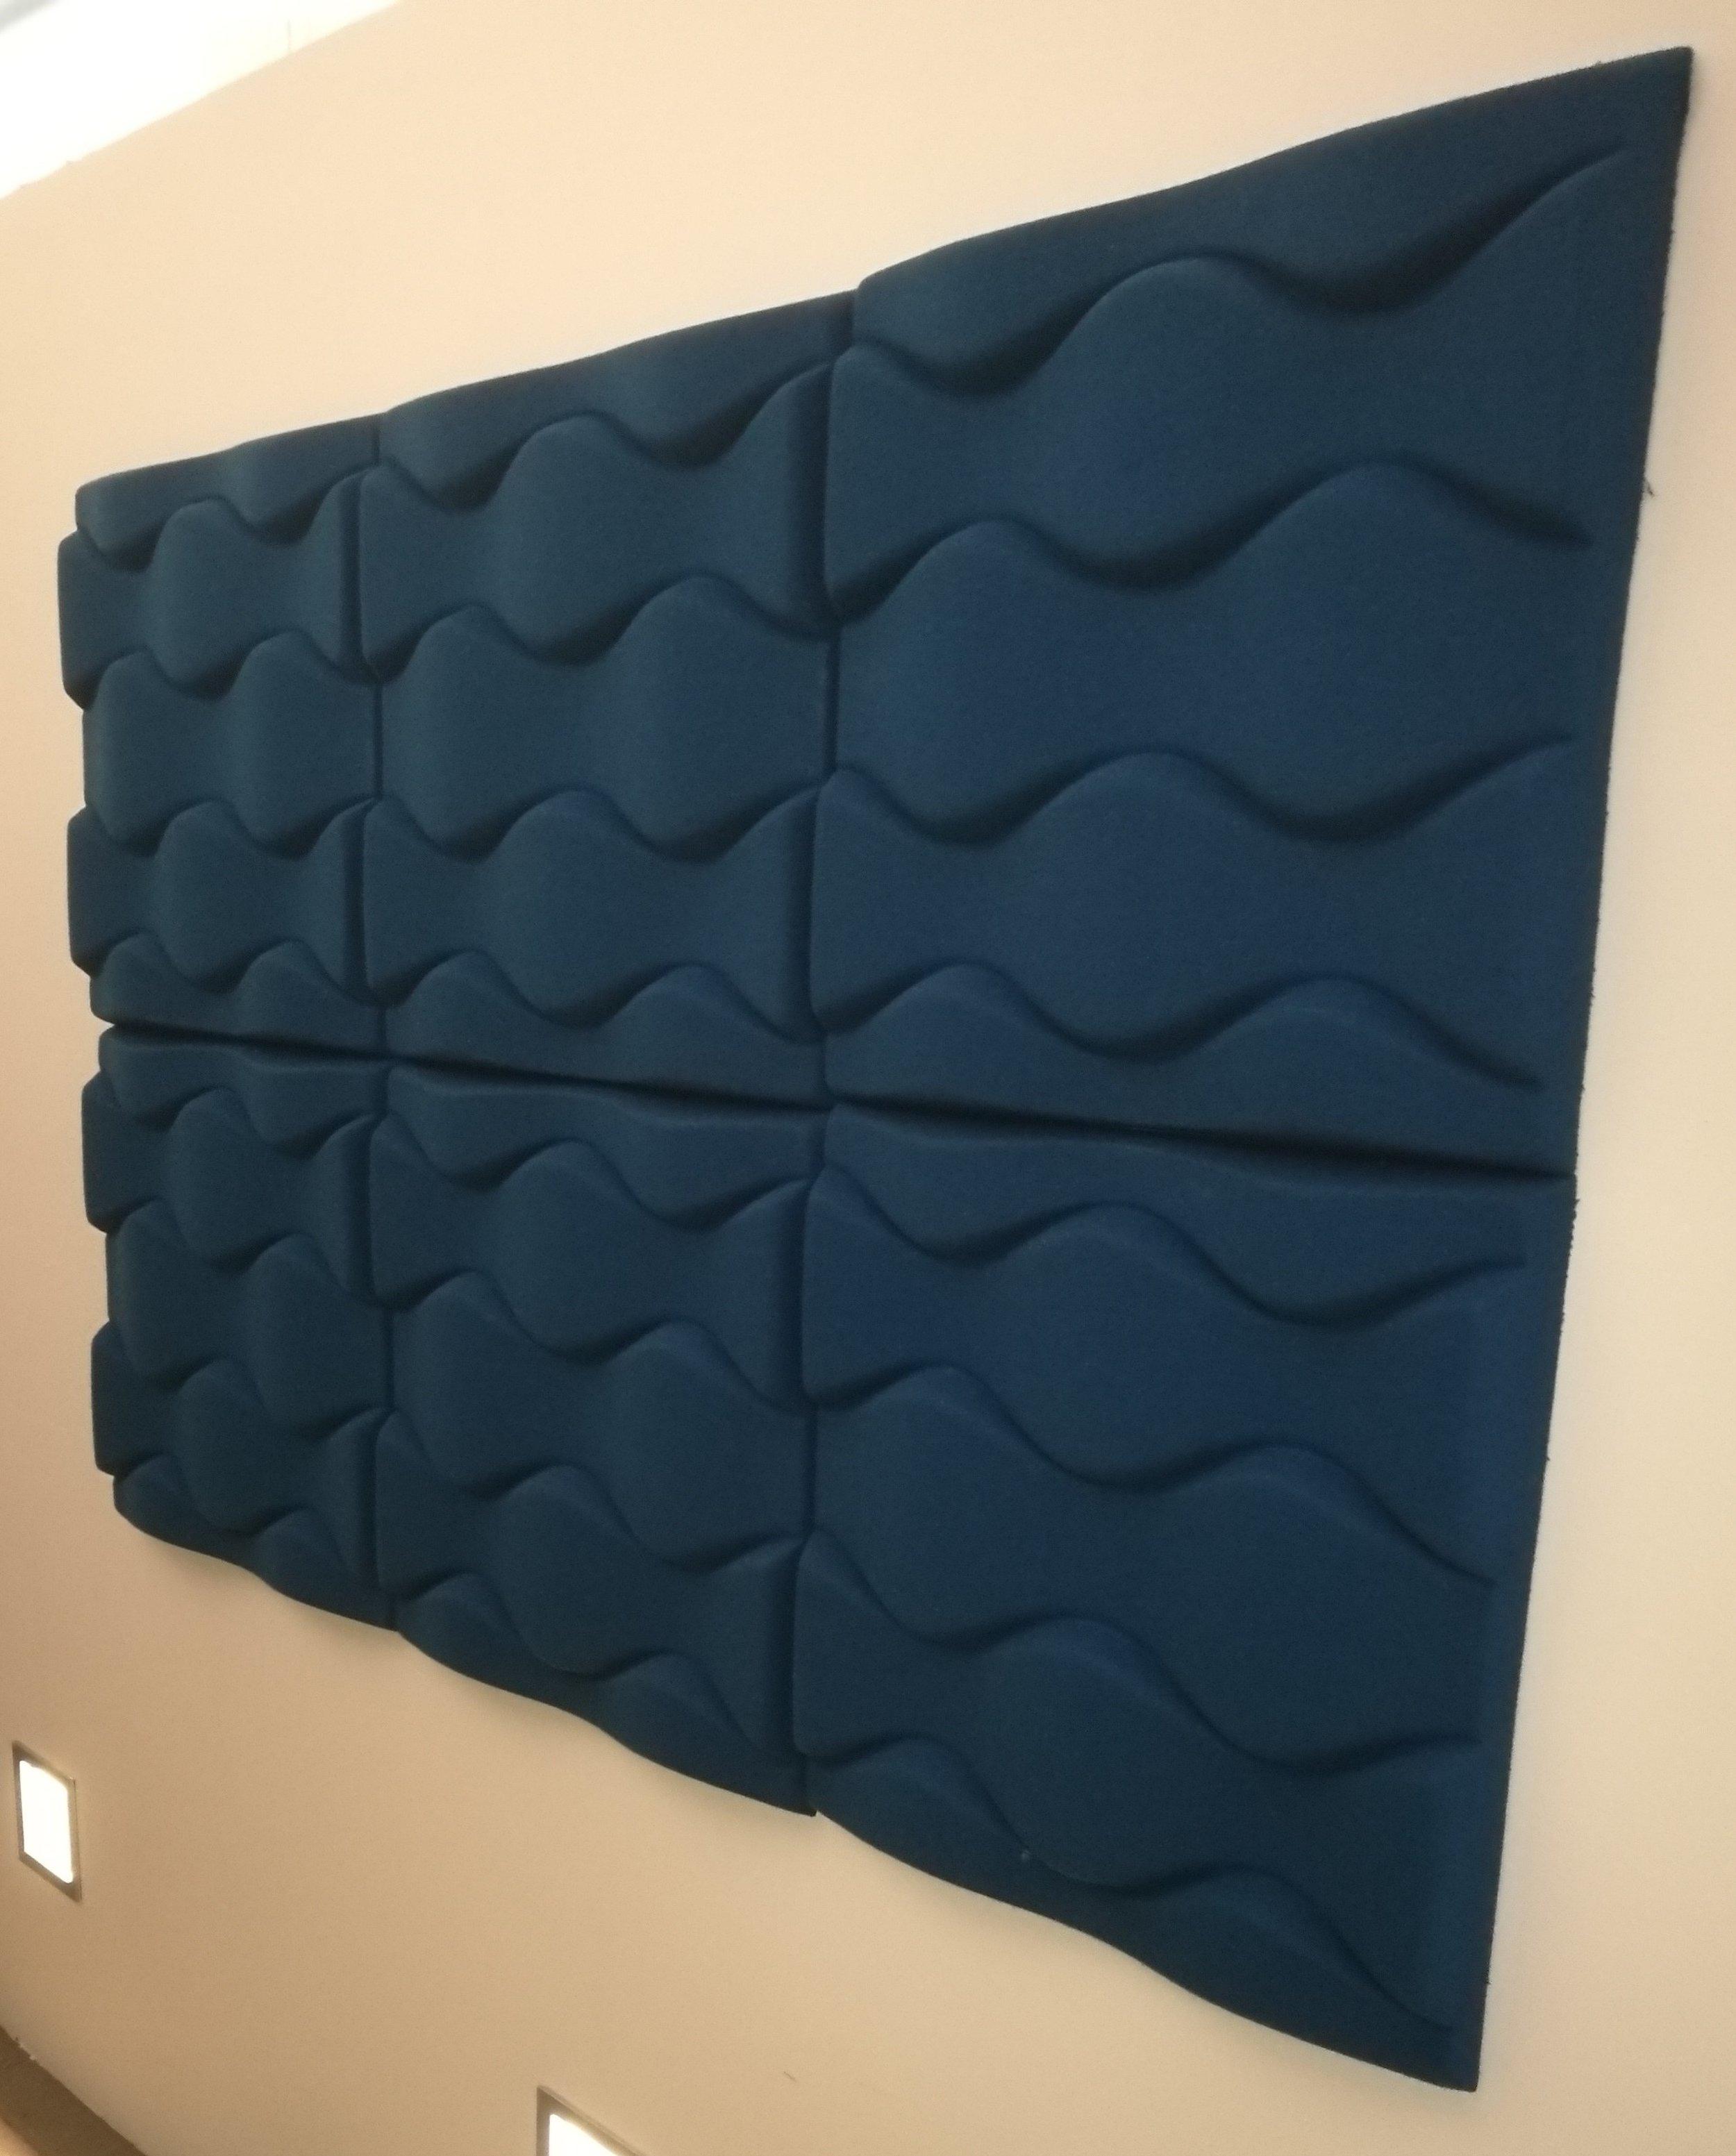 SOUNDWAVE FLO (6 stk)     Formpresset polyesterfiber i mørkeblå   Førpris NOK 1'320 eks mva pr. stk  Nåpris NOK 330 eks. mva  pr. stk